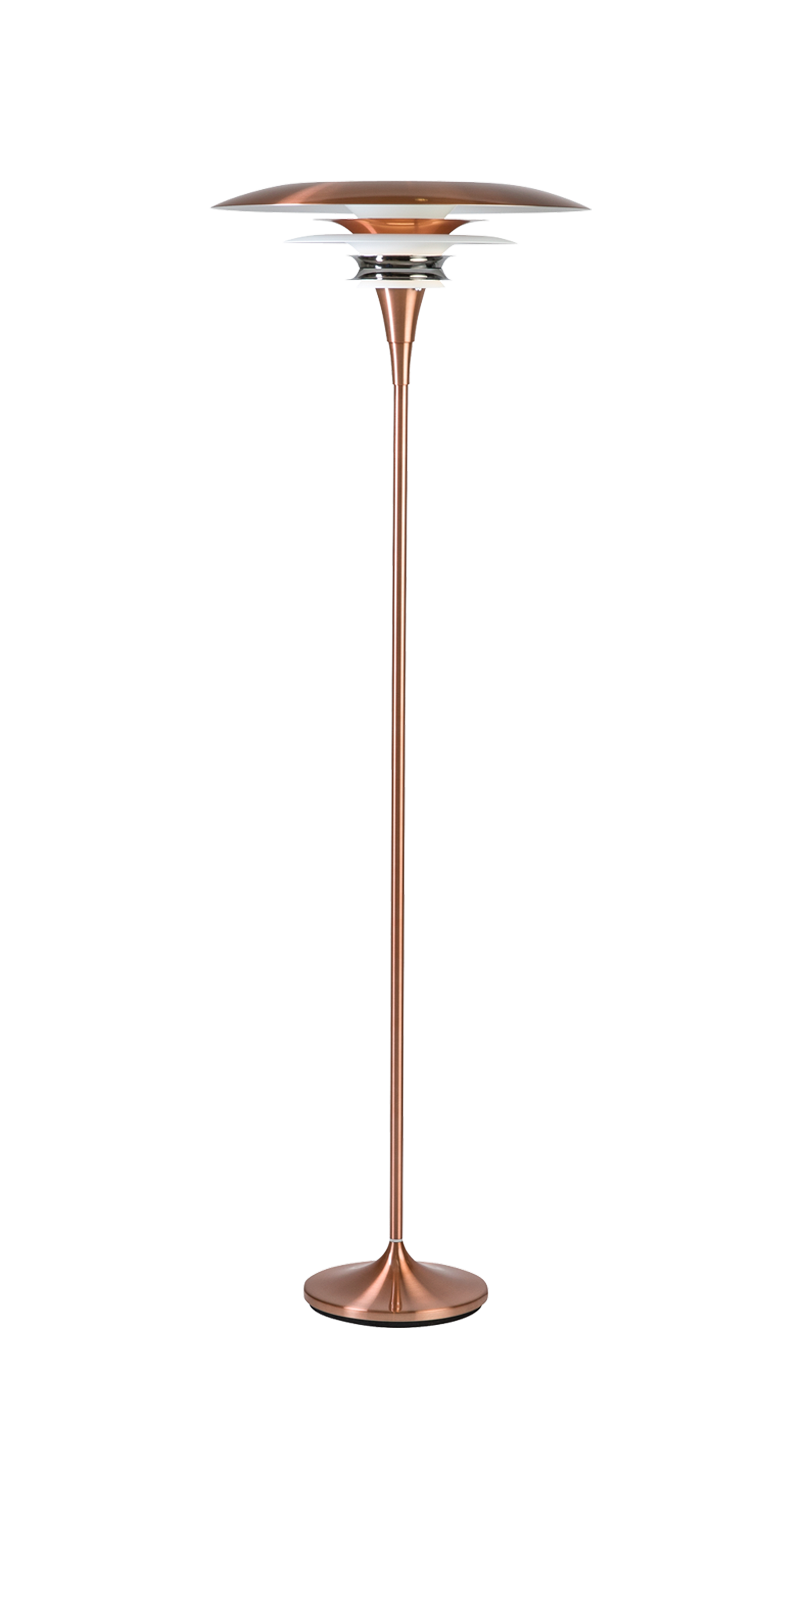 Belid Diablo 3366 kobber